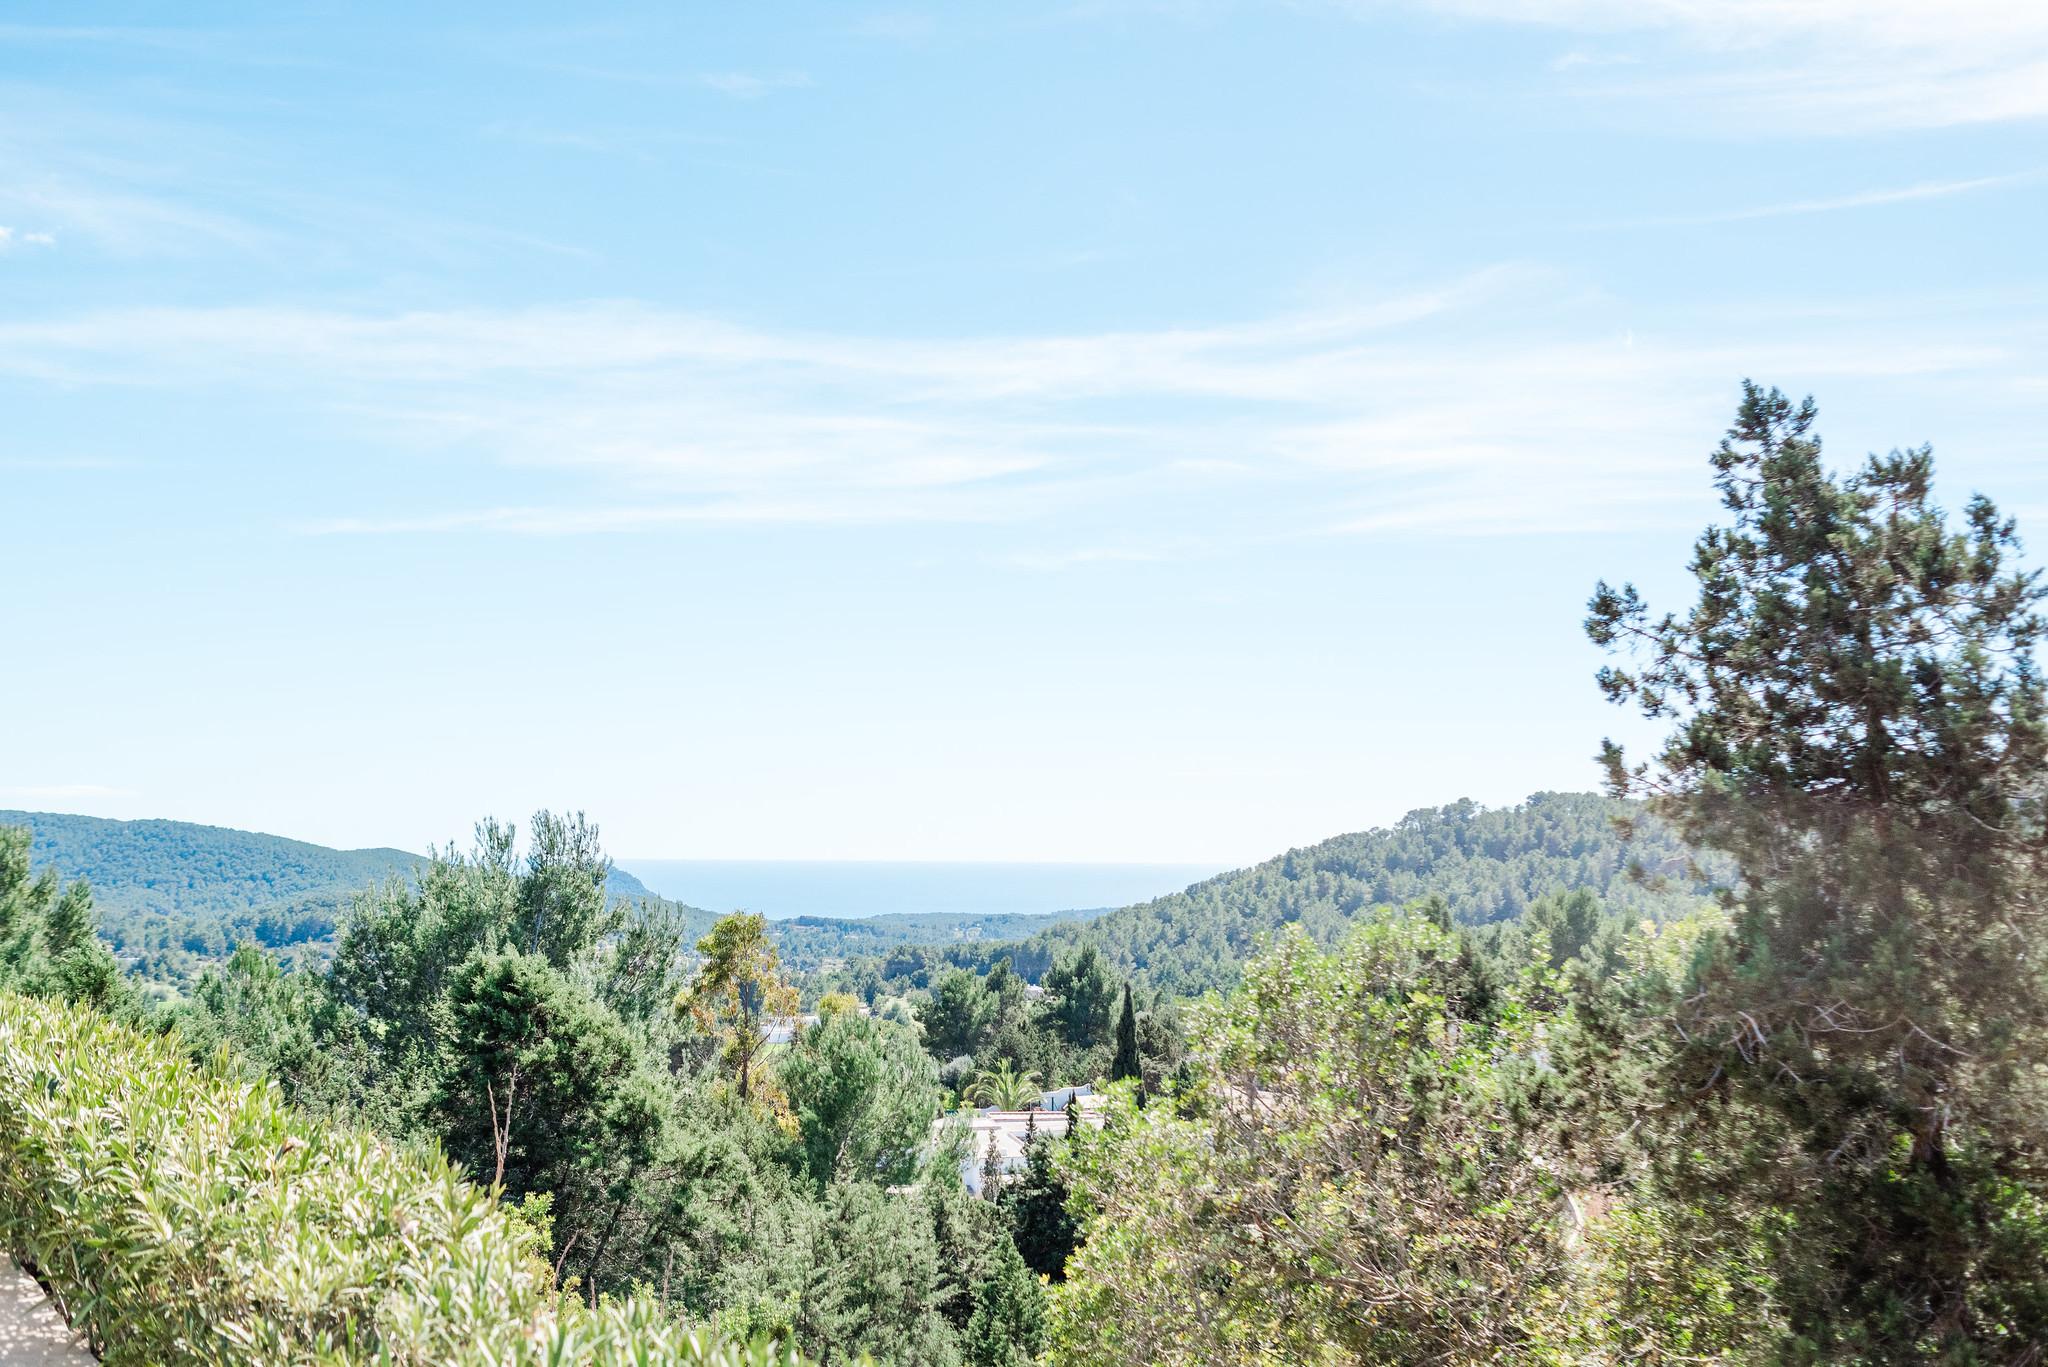 https://www.white-ibiza.com/wp-content/uploads/2020/06/white-ibiza-villas-villa-andrea-exterior-view.jpg